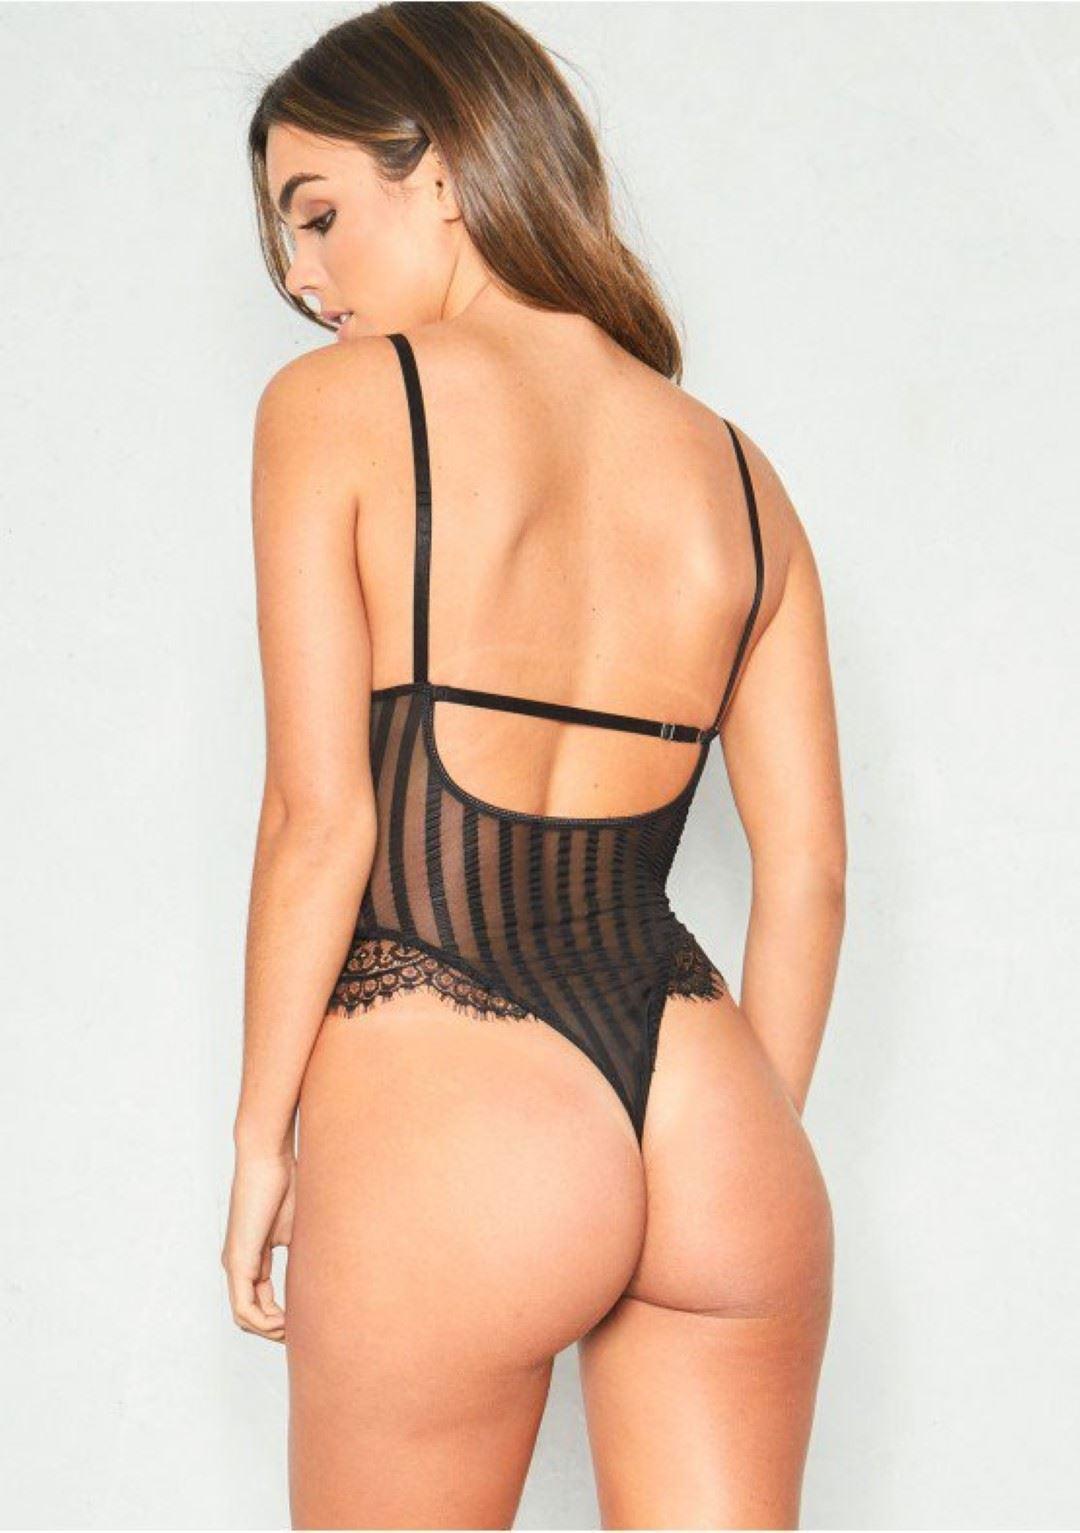 99af020fb2 Ladies Striped Lace Bodysuit Cut Out Sheer Mesh Eyelash Fishnet ...